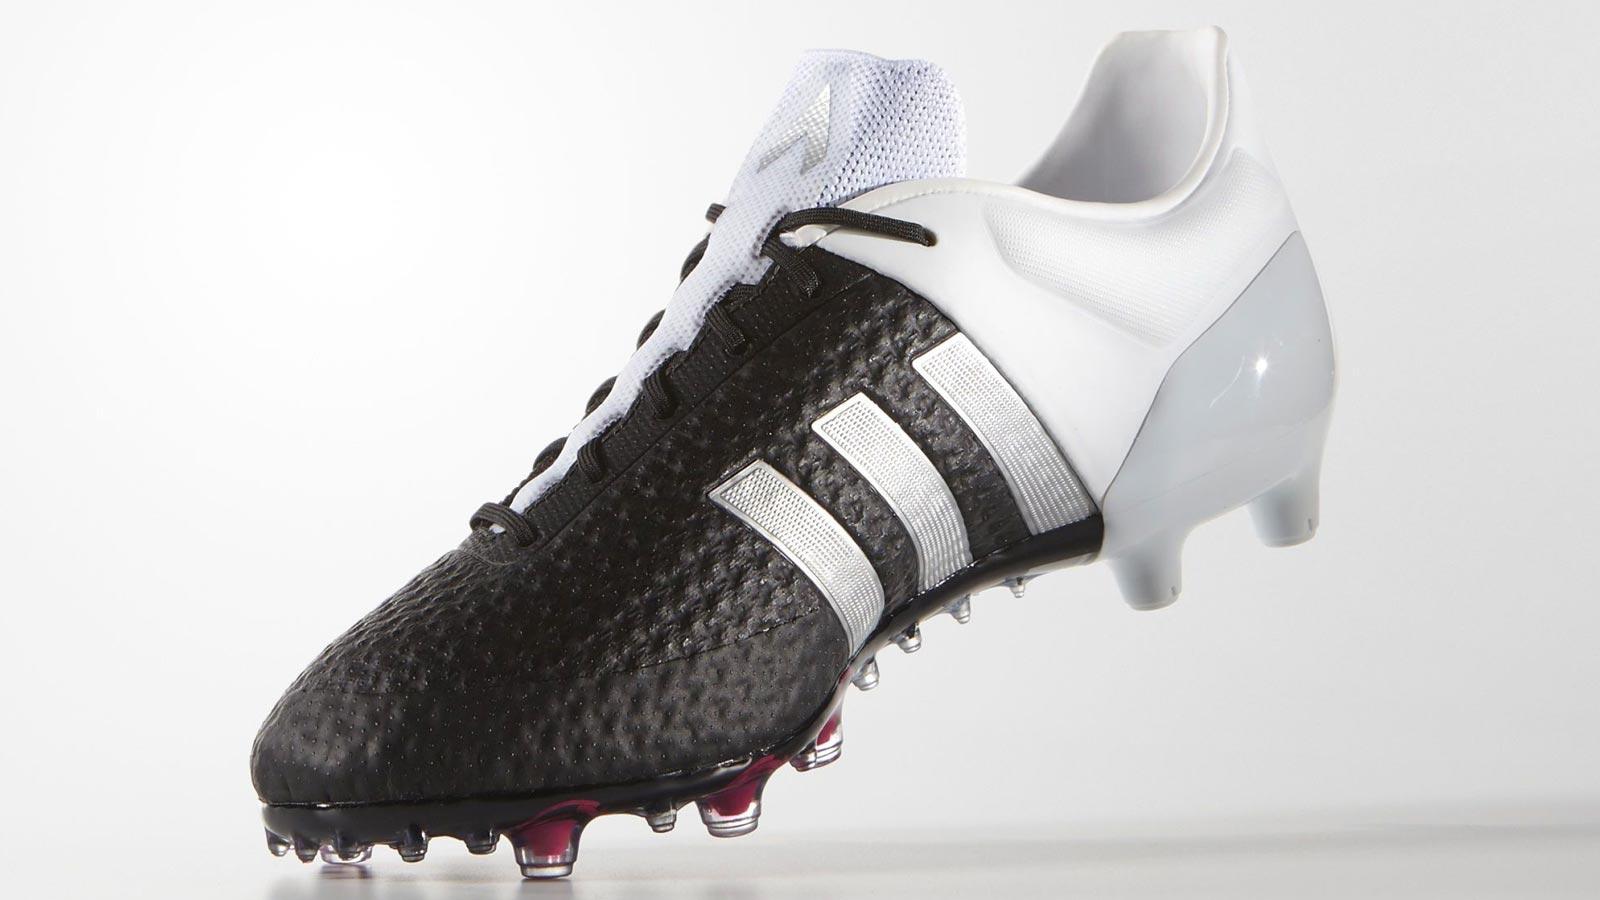 Adidas Ace 15.1 Primeknit